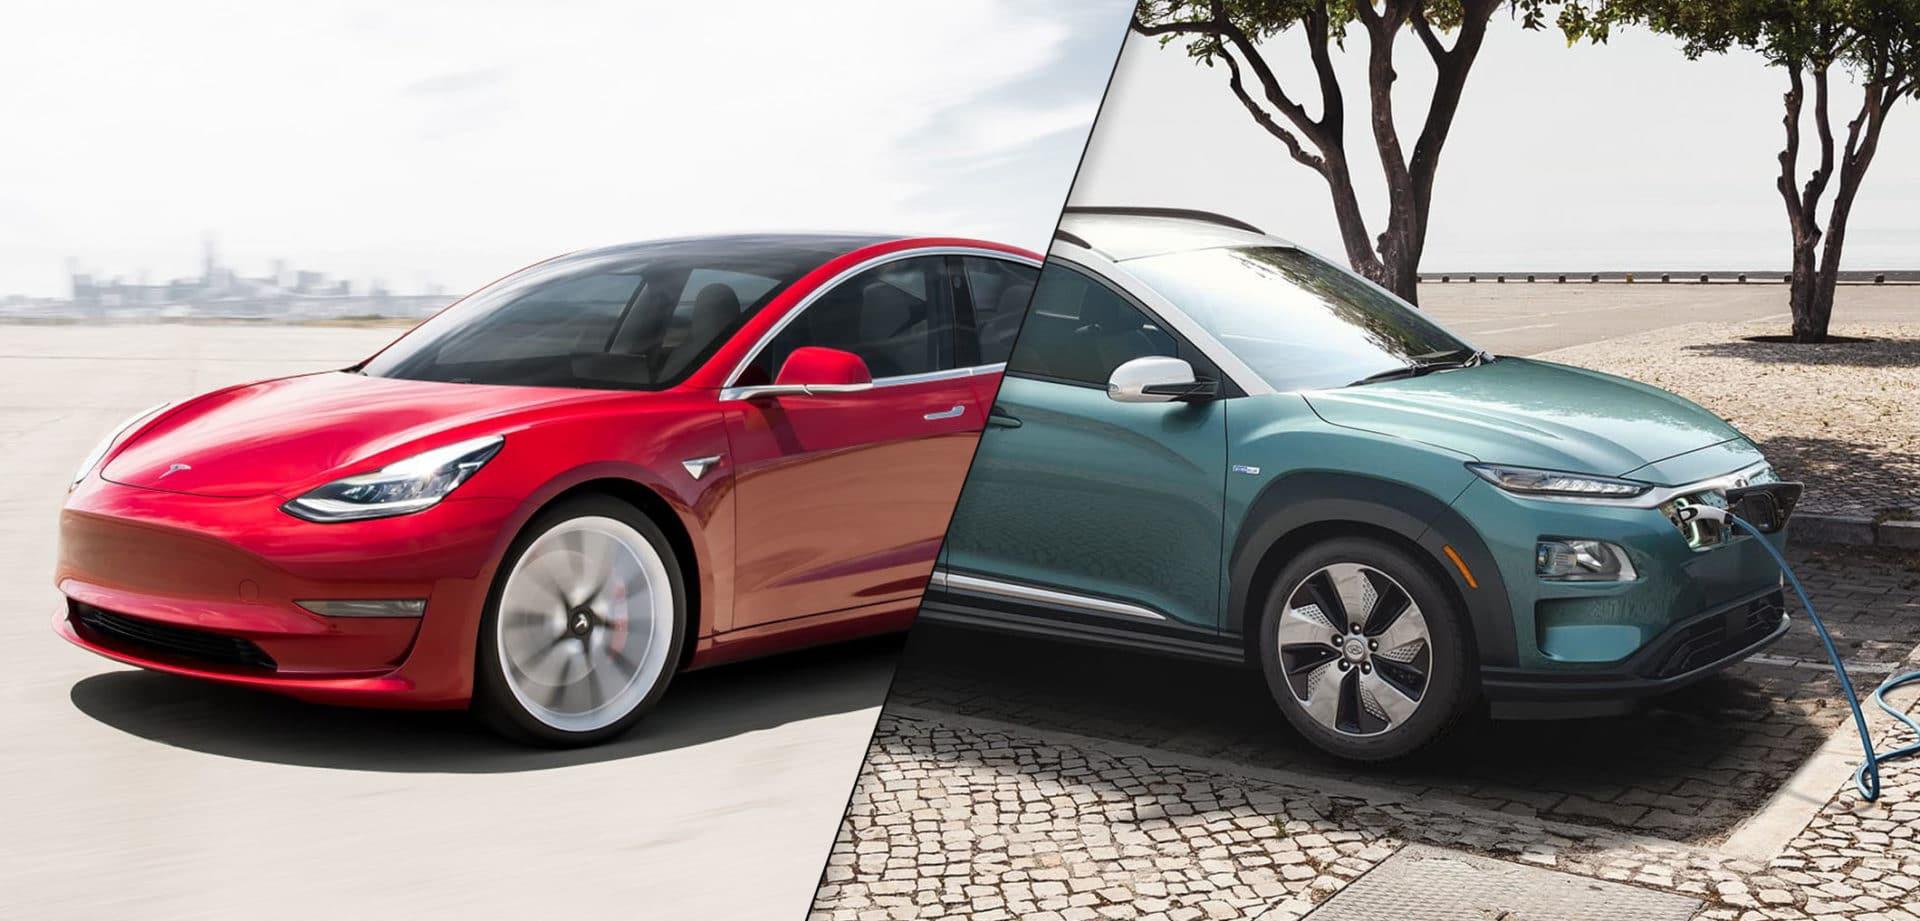 2019 Tesla Model 3 vs 2019 Hyundai Kona EV